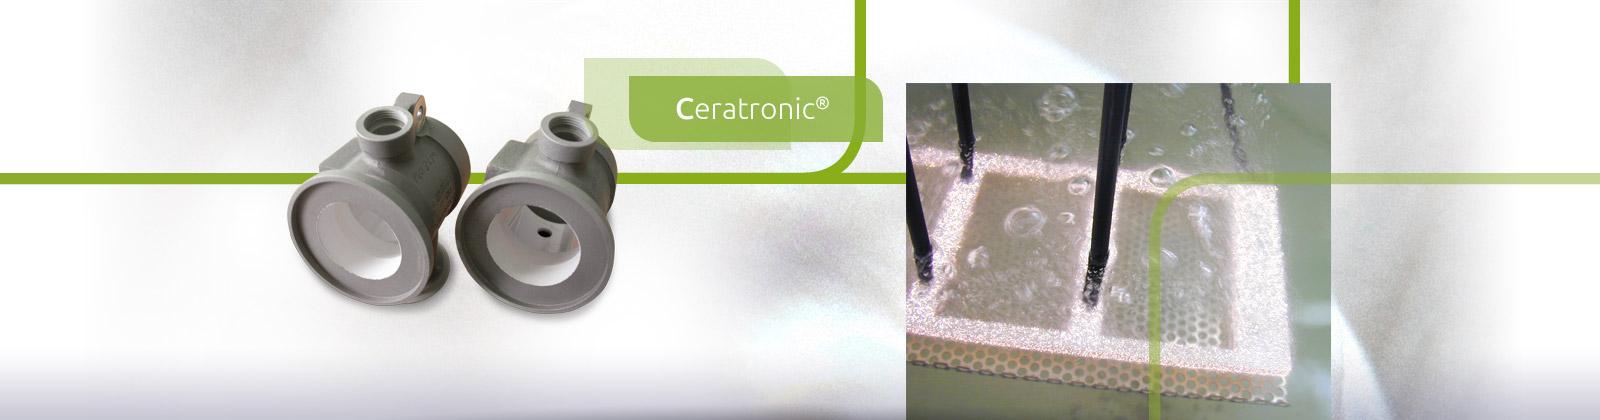 Galvanoplastie industrielle : Cératronic